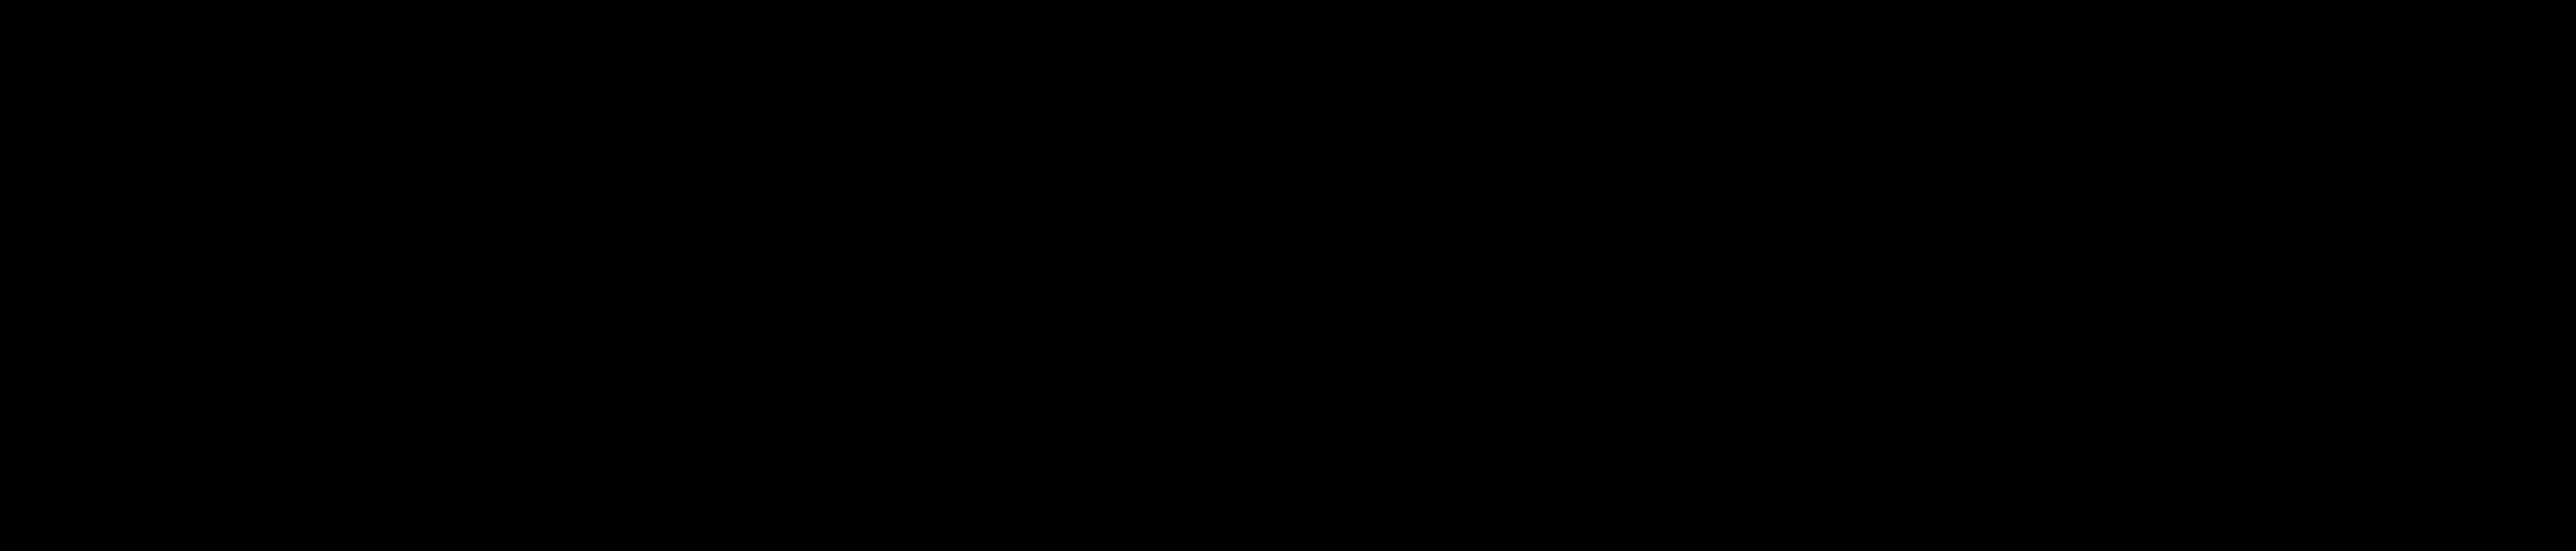 National Pharmacy Technician Association (NPTA) Logo